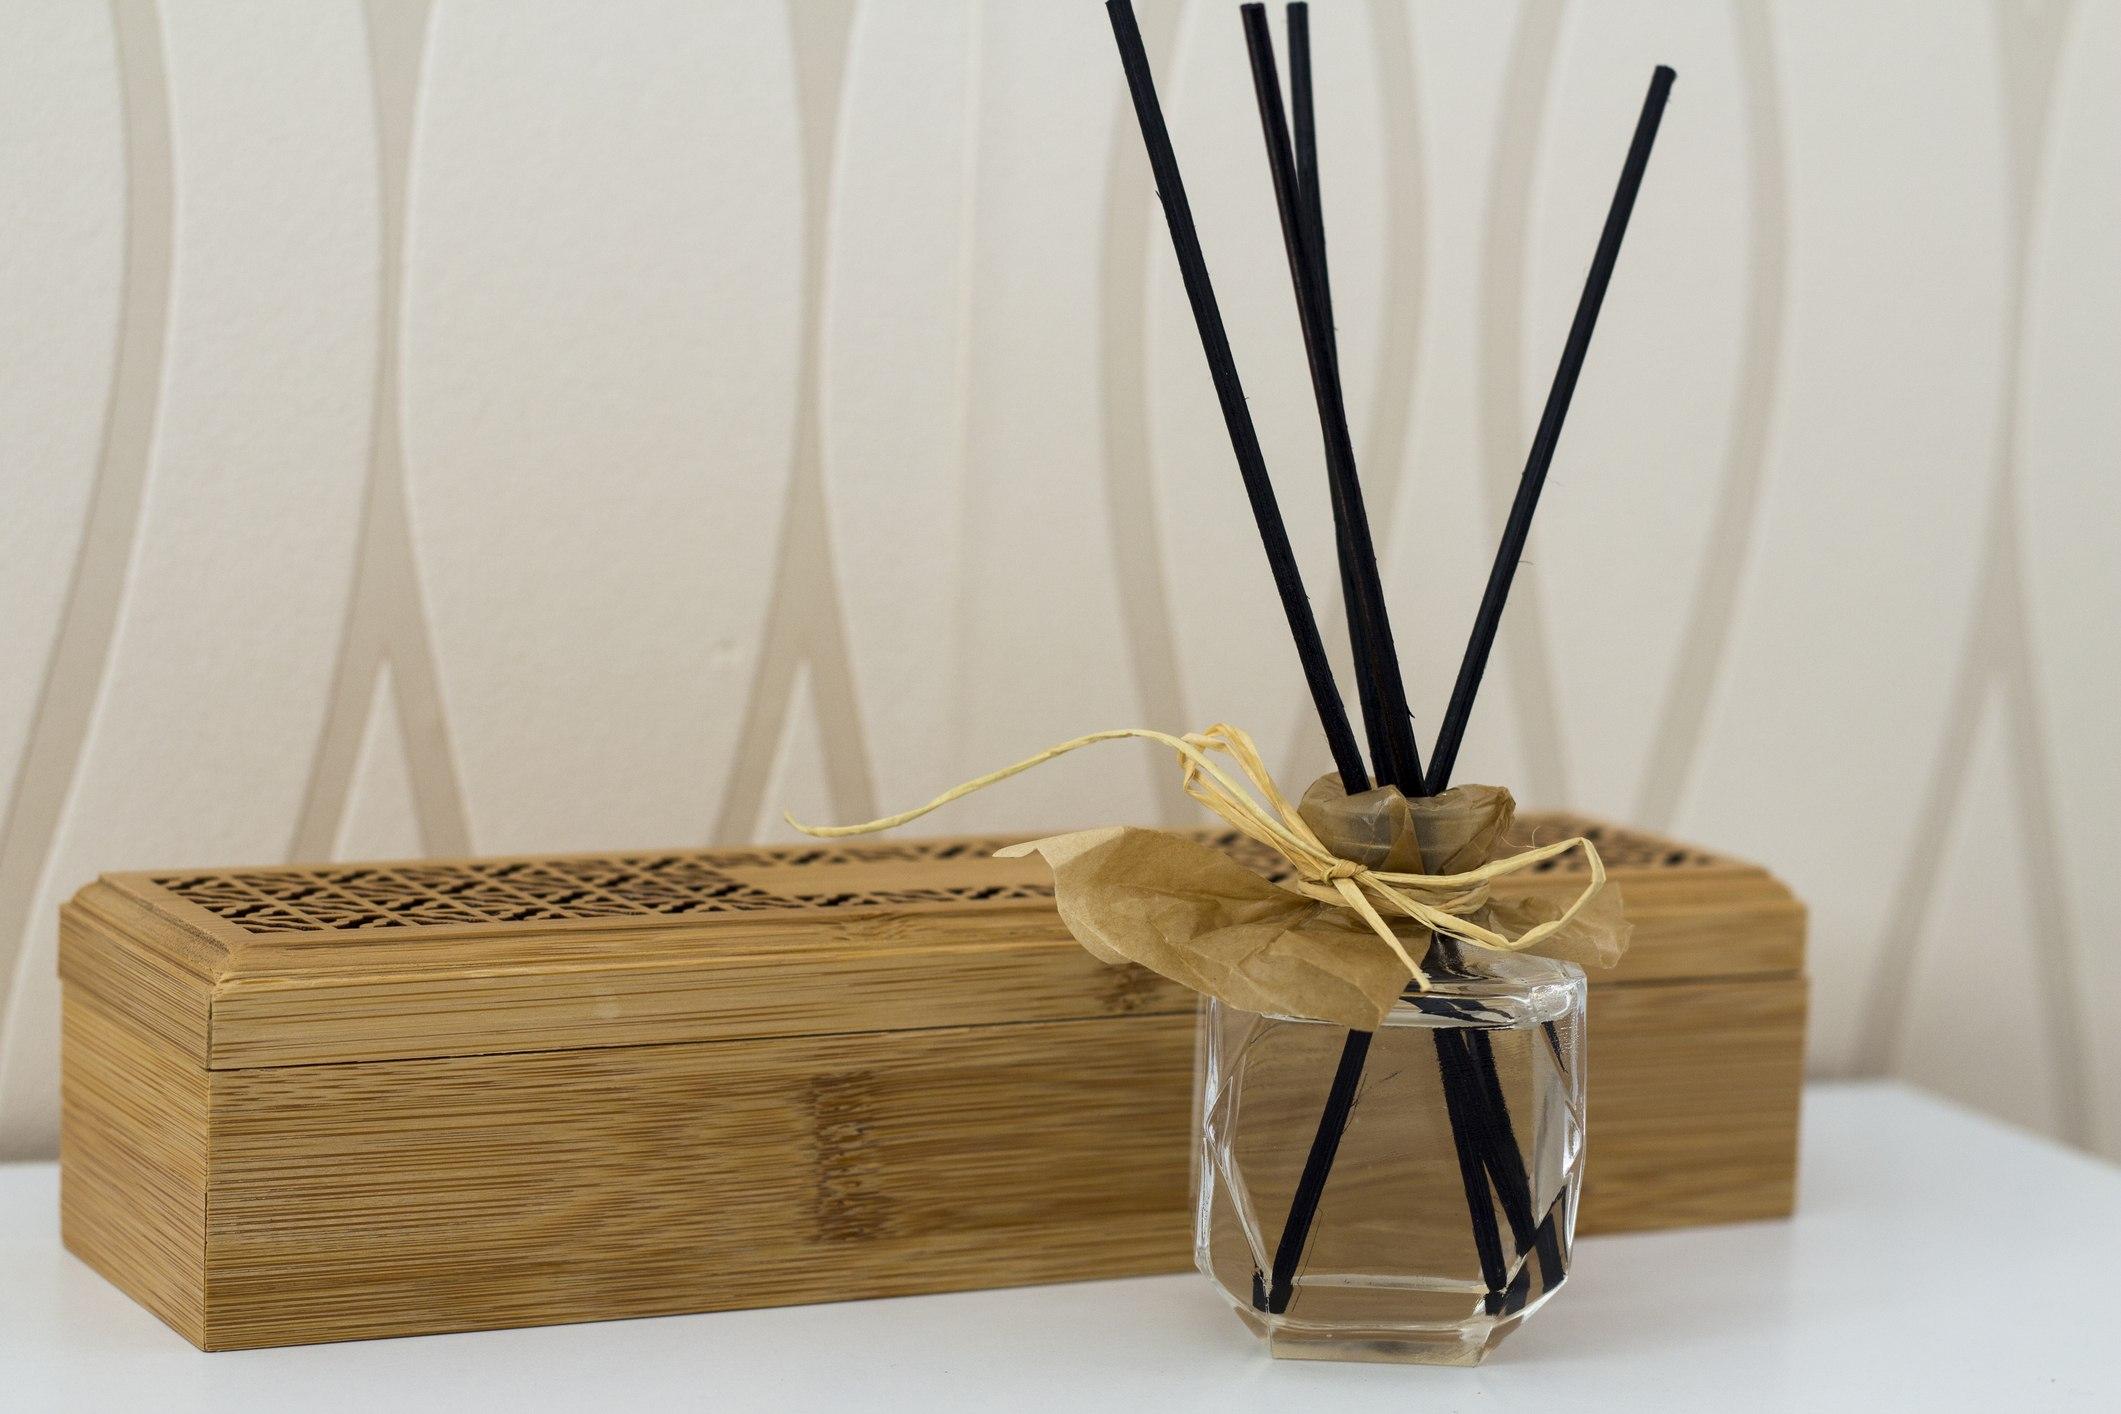 Aroma diffuser sticks